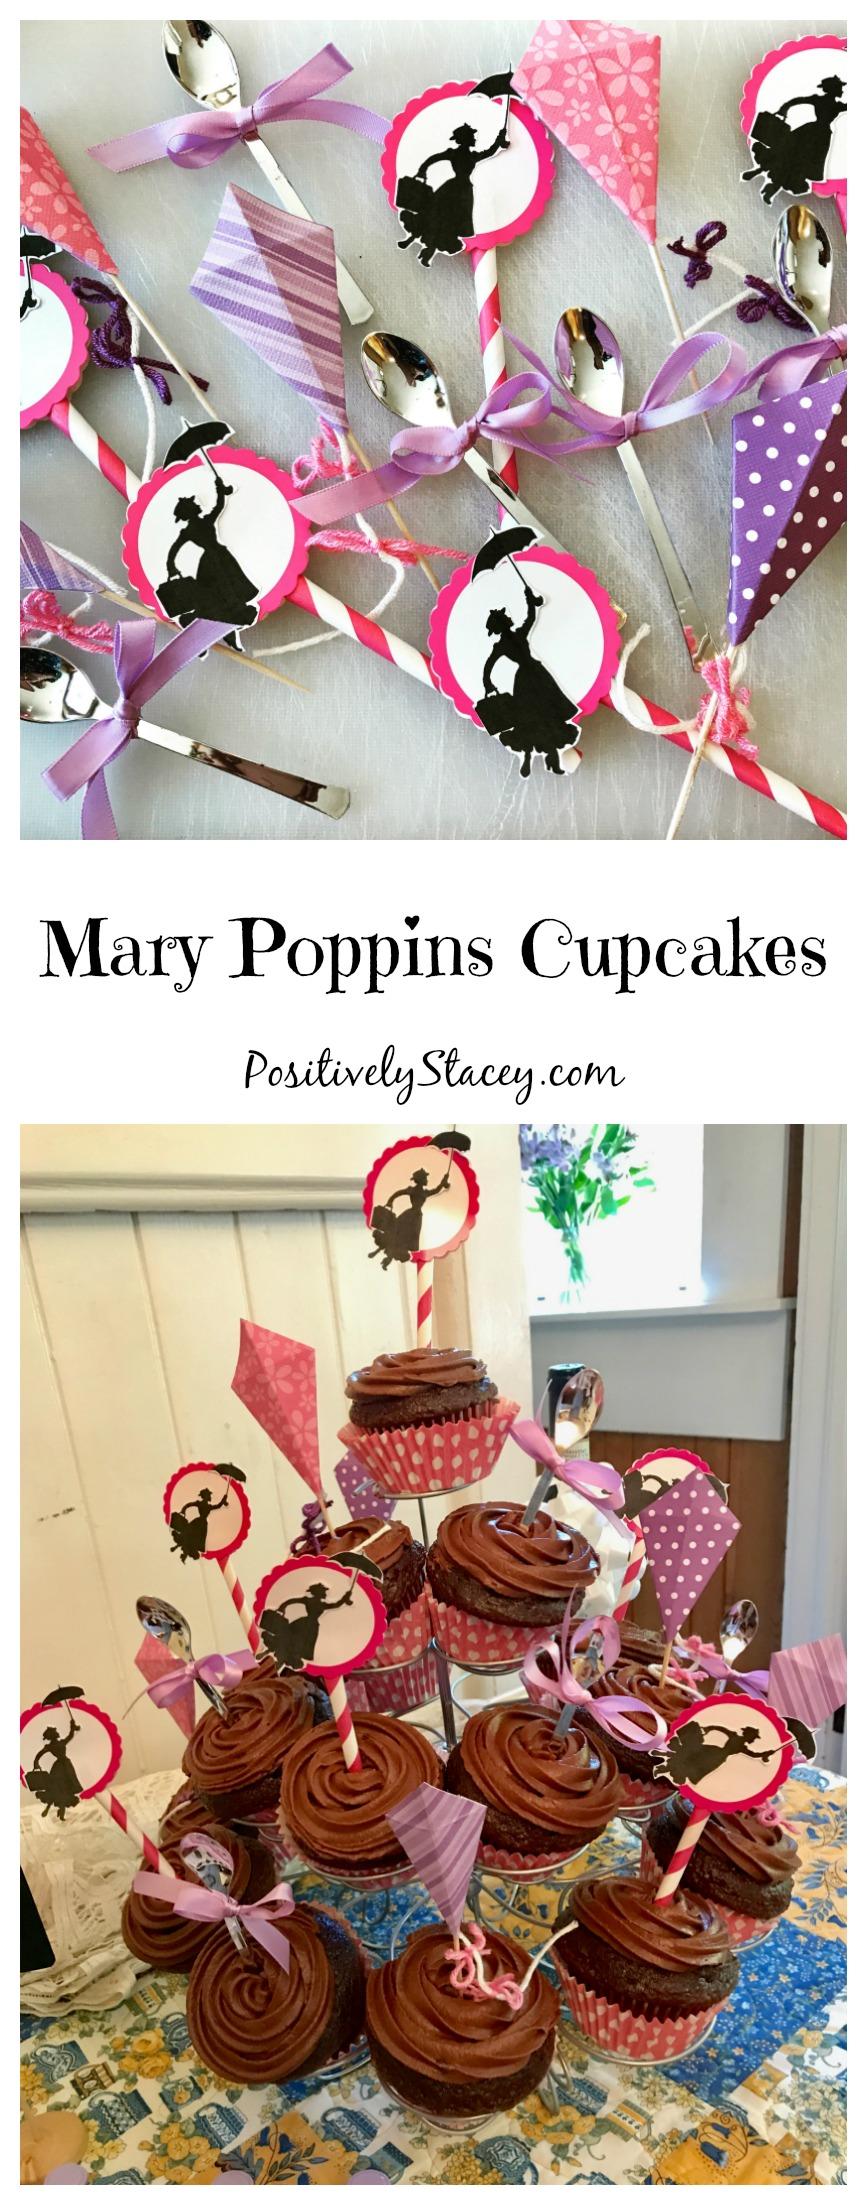 Mary Poppins Cupcakes